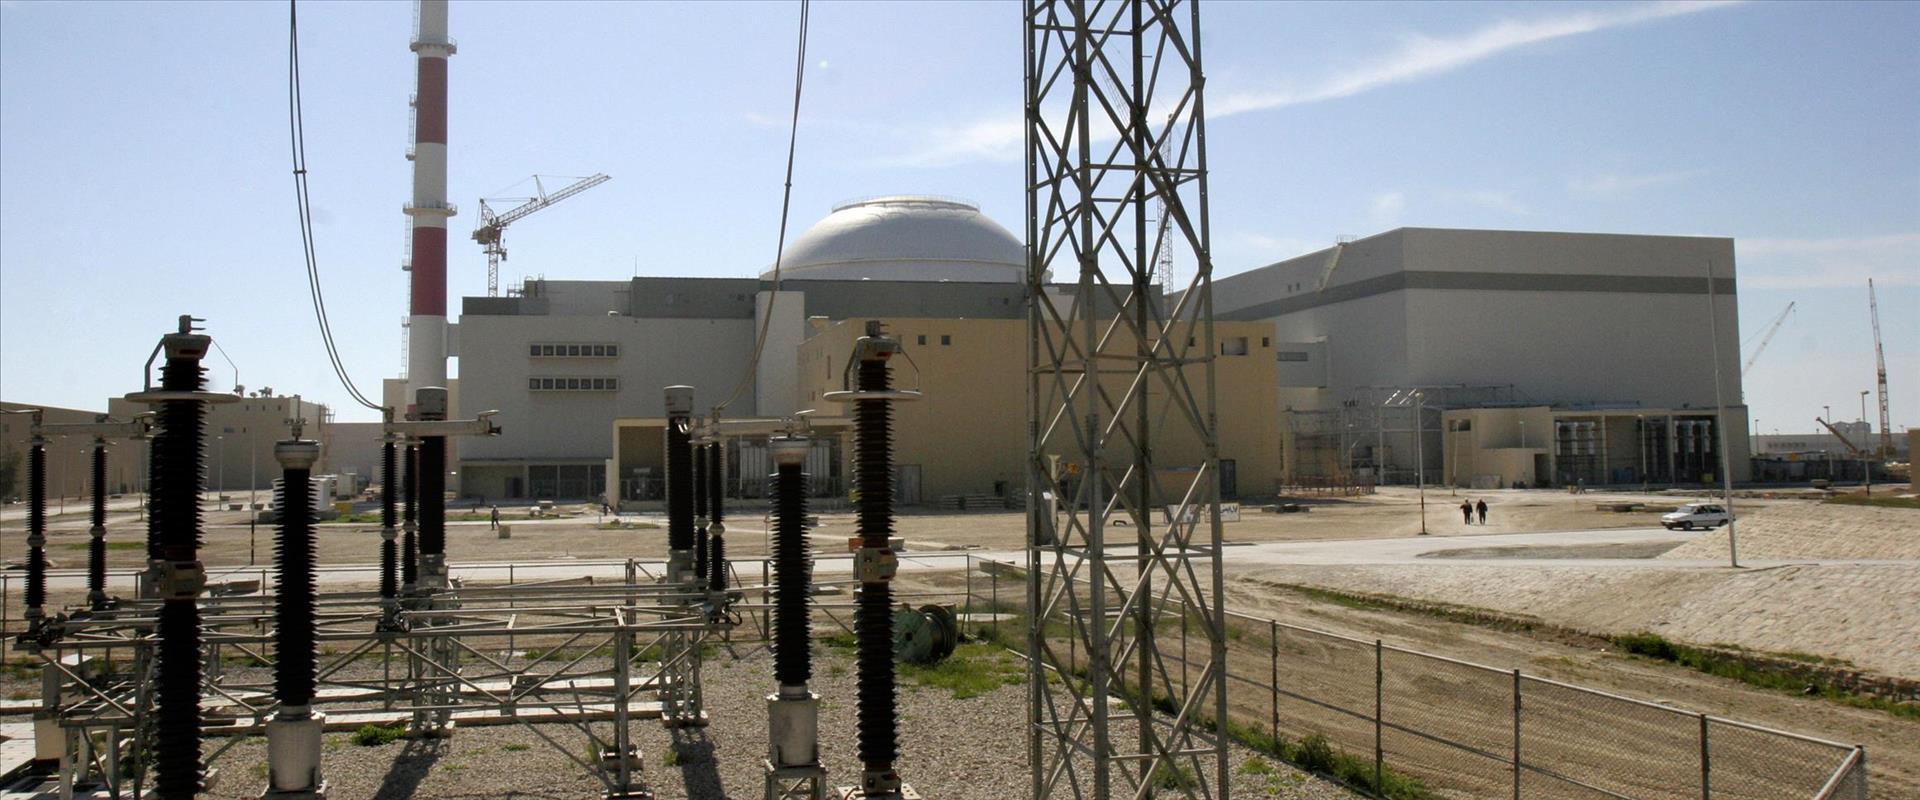 מתקן גרעין